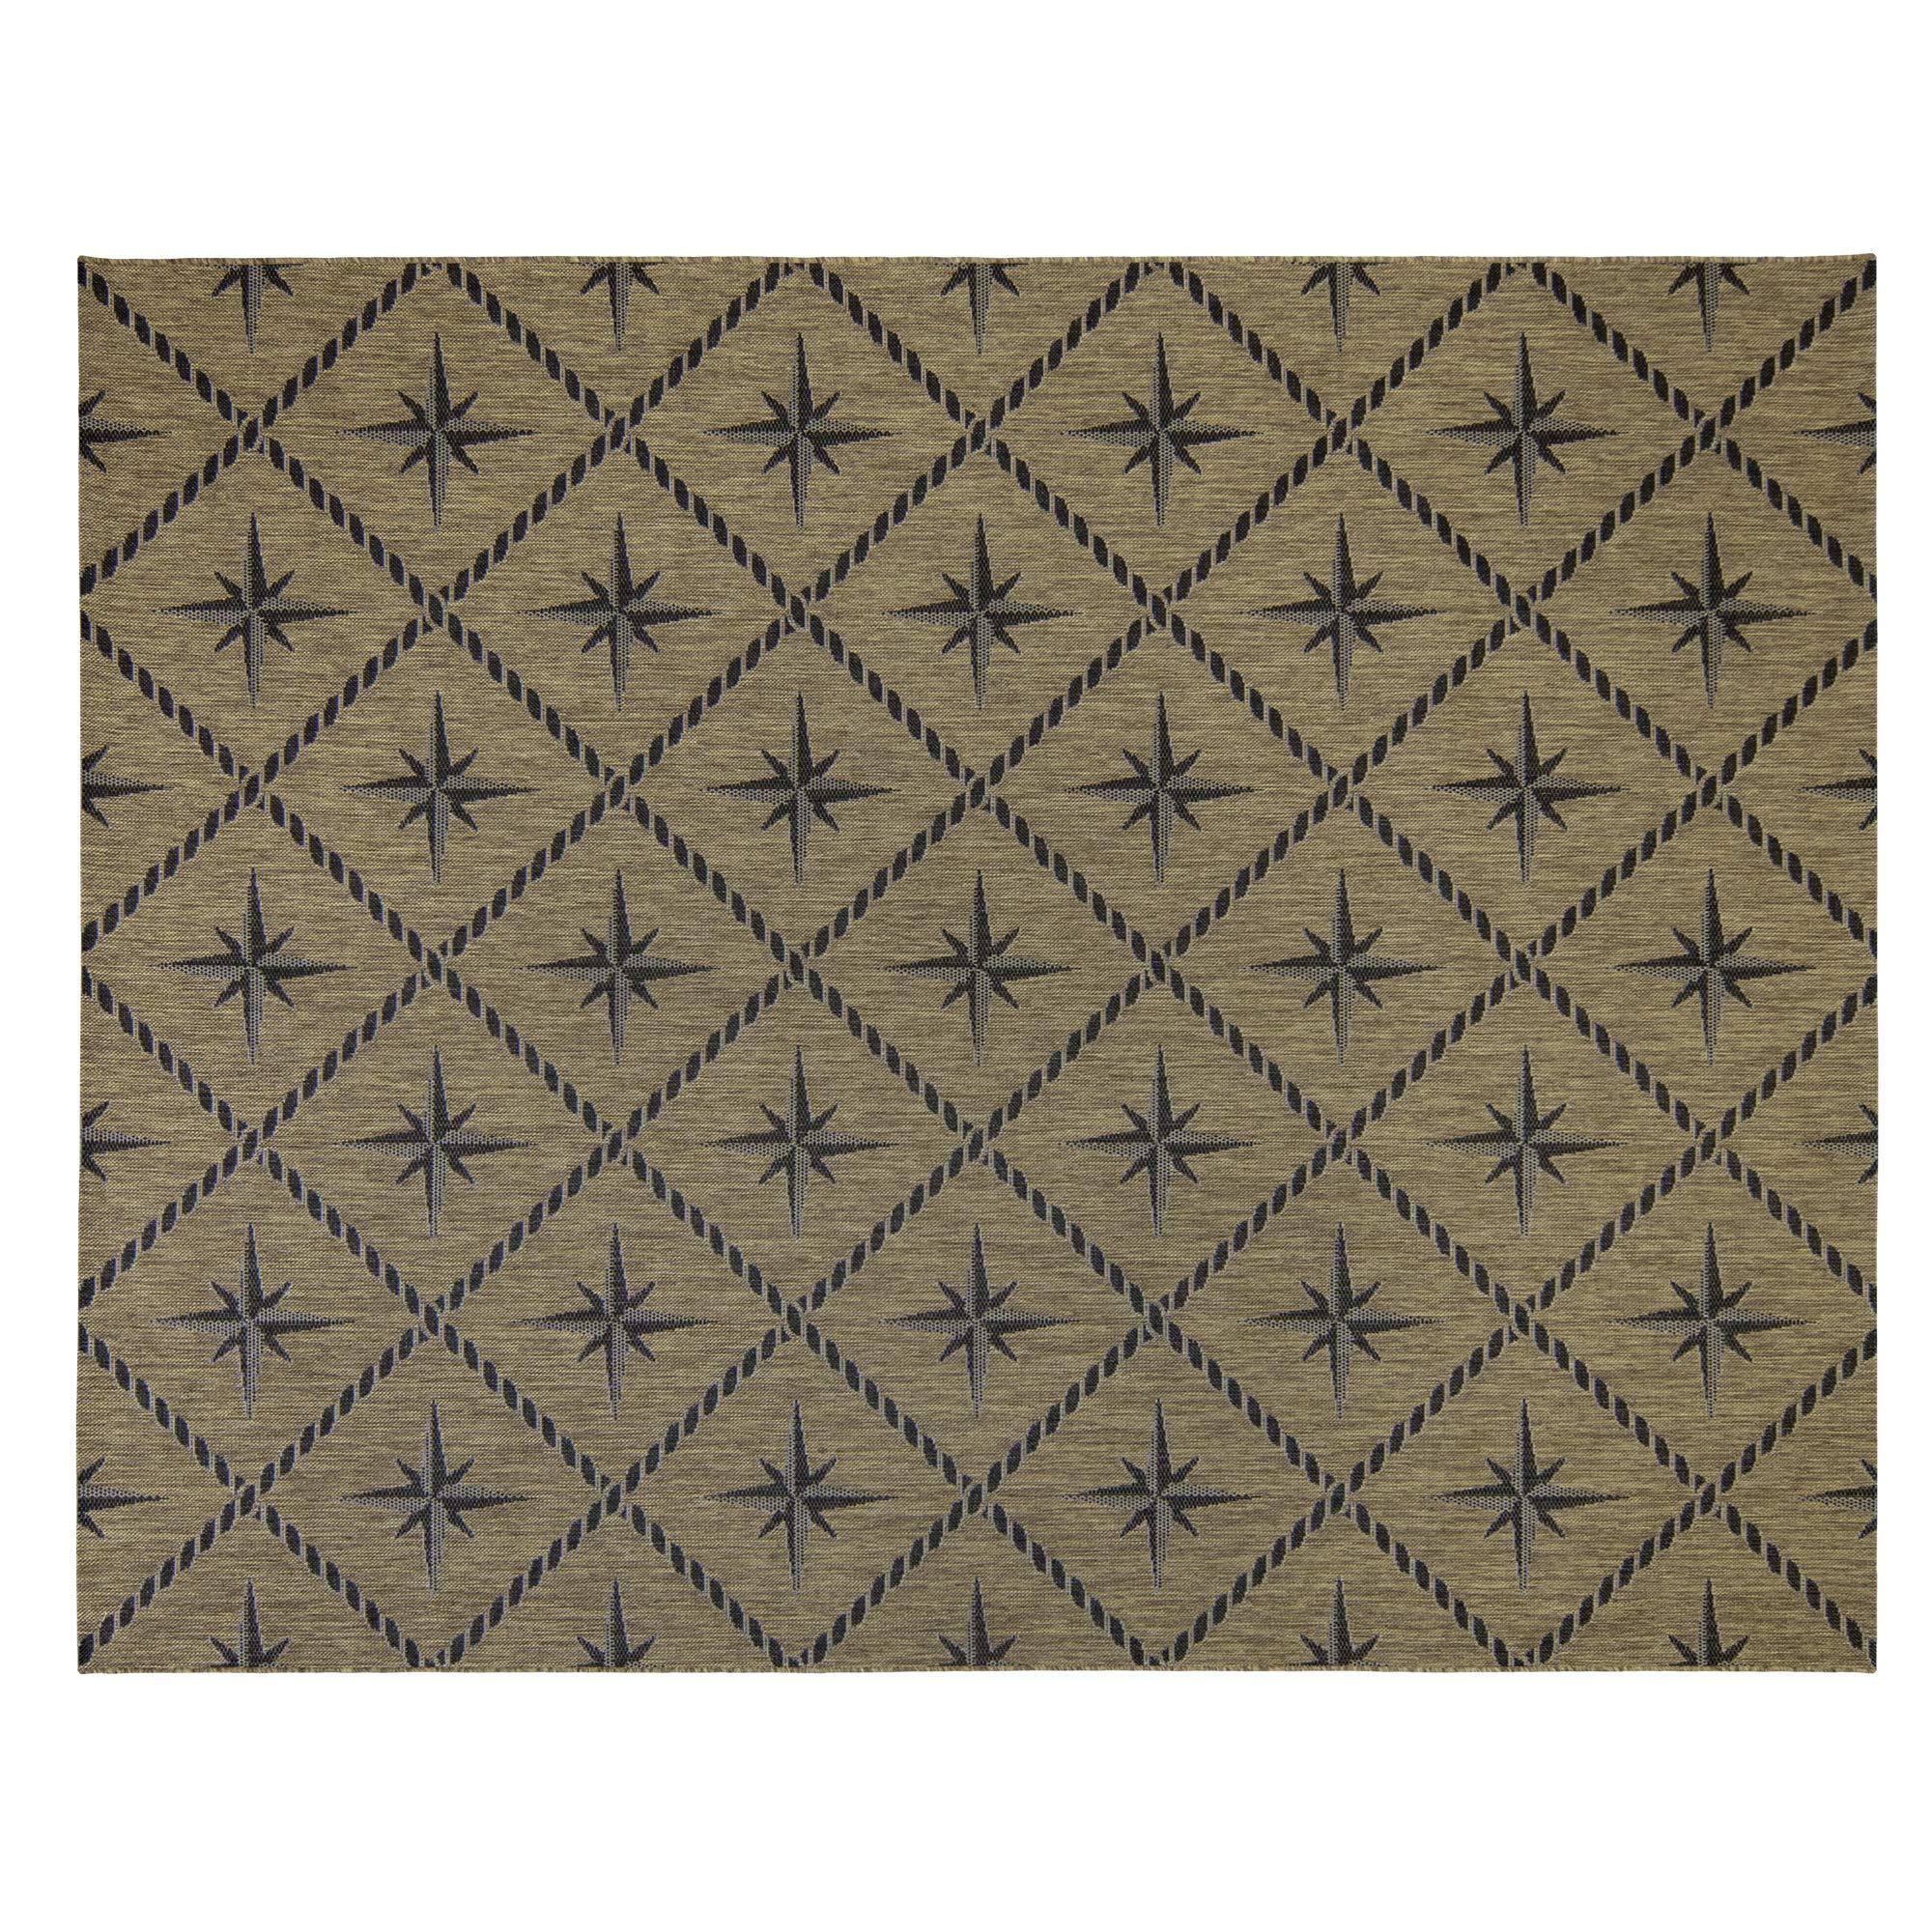 Gertmenian 21634 Coastal Tropical Carpet Outdoor Patio Rug, 8x10 Large, Brown North Star